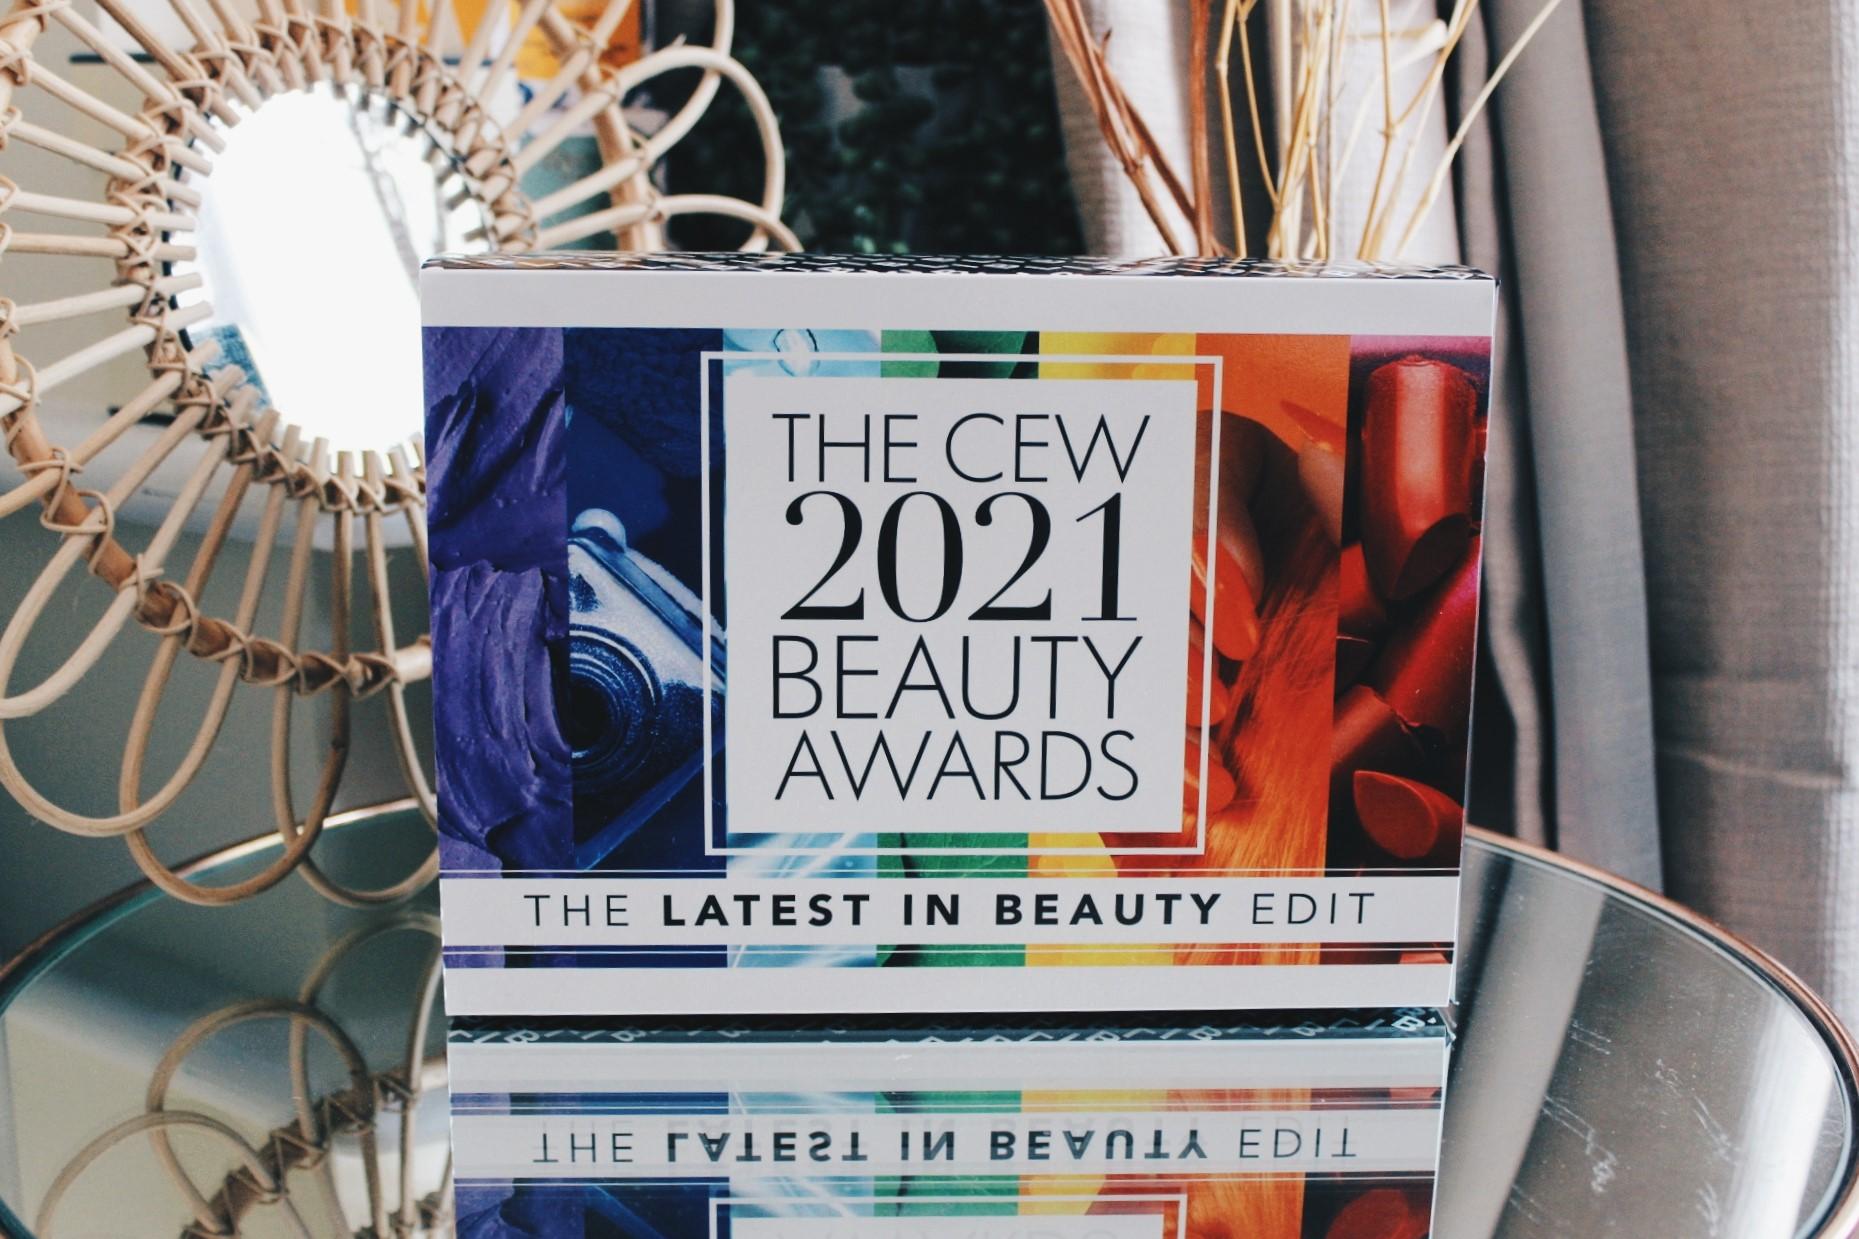 The CEW 2021 Beauty Awards // Latest in Beauty